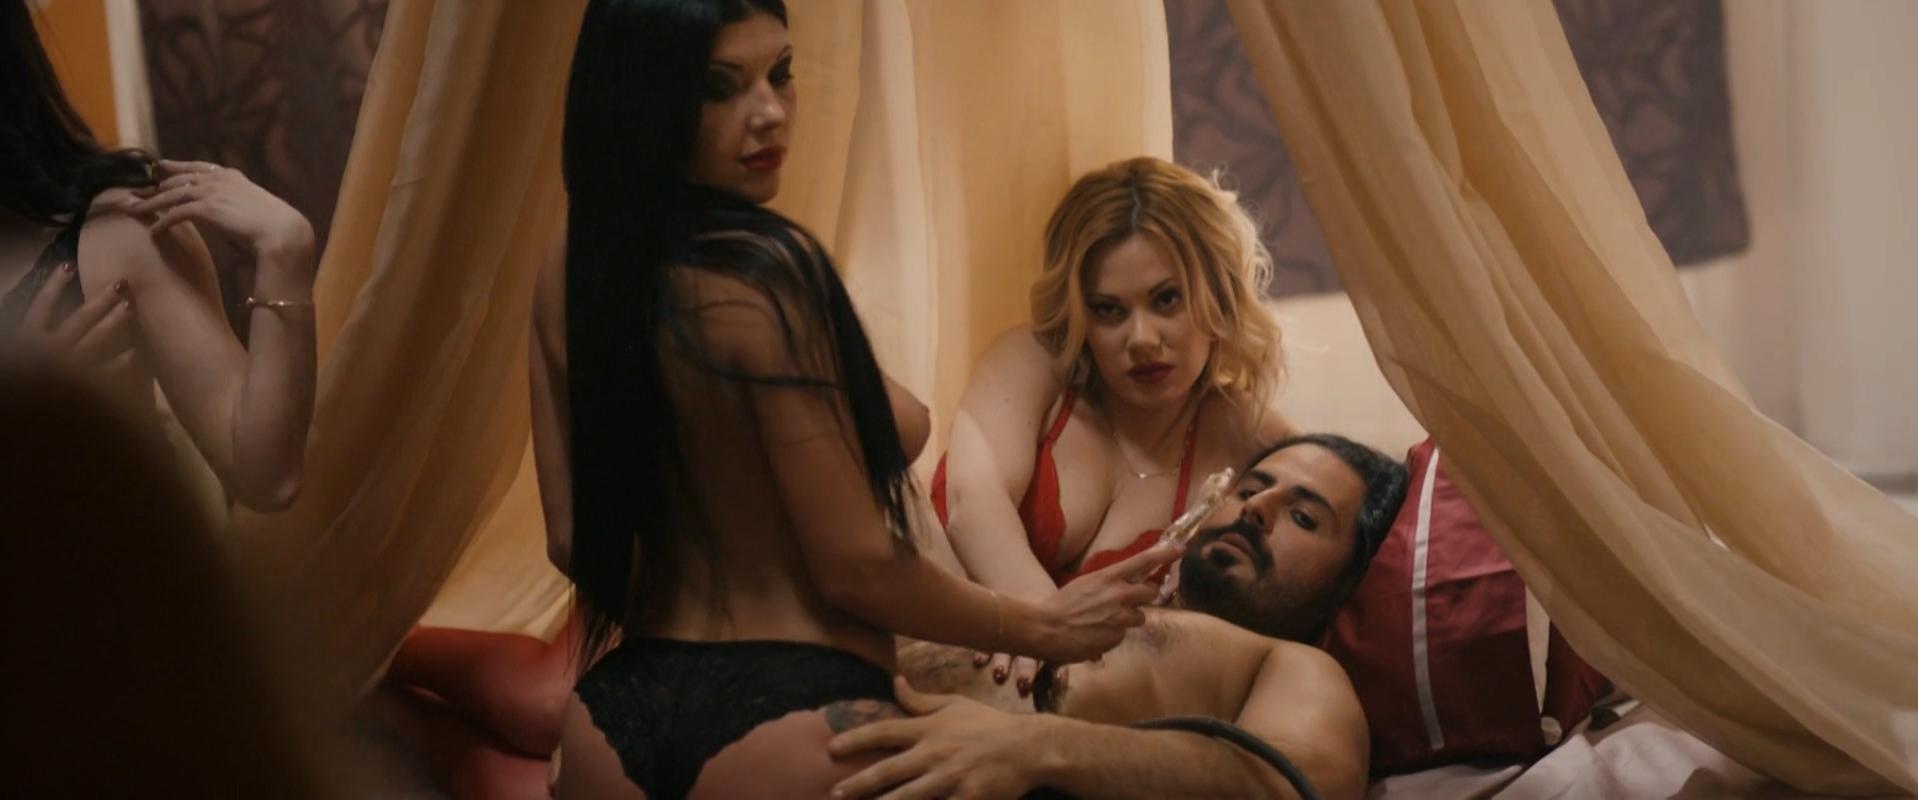 Jessica Henwick Nua nude video celebs » christine nguyen nude, jessica uberuaga